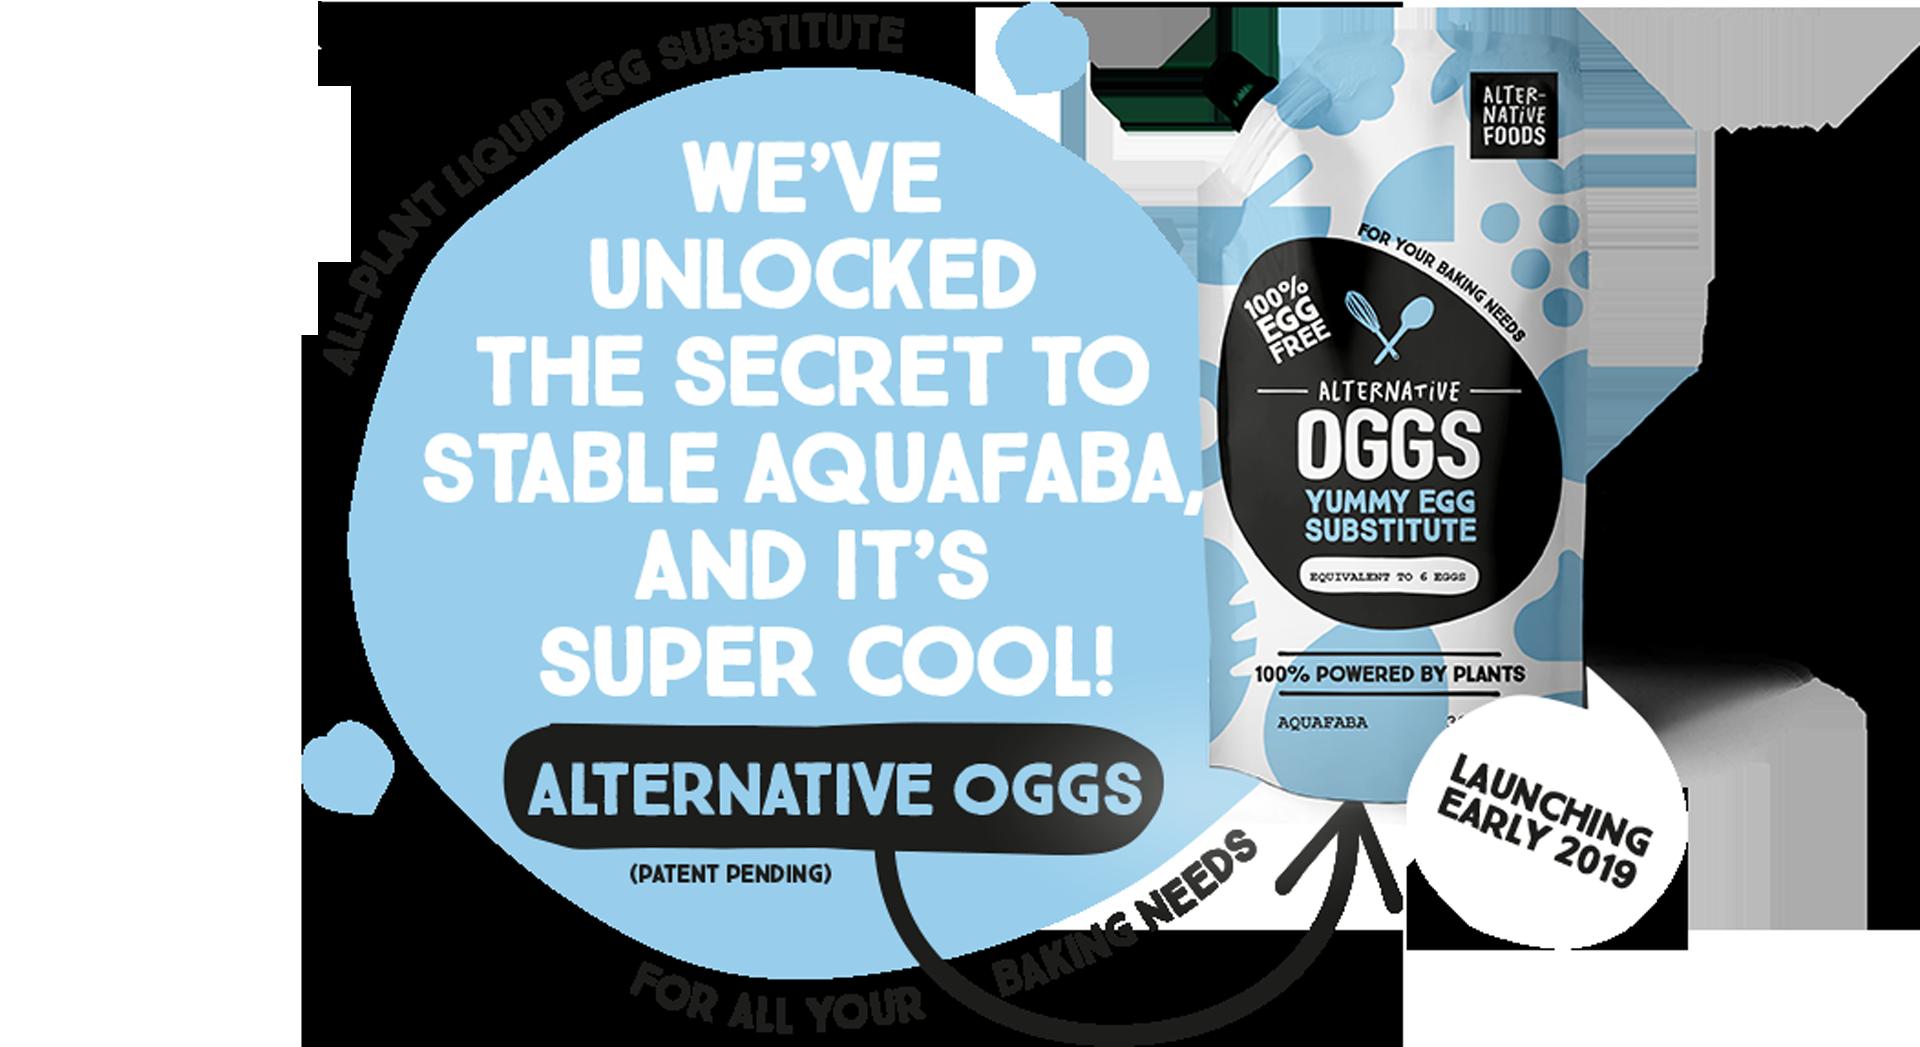 oggs - aquafaba